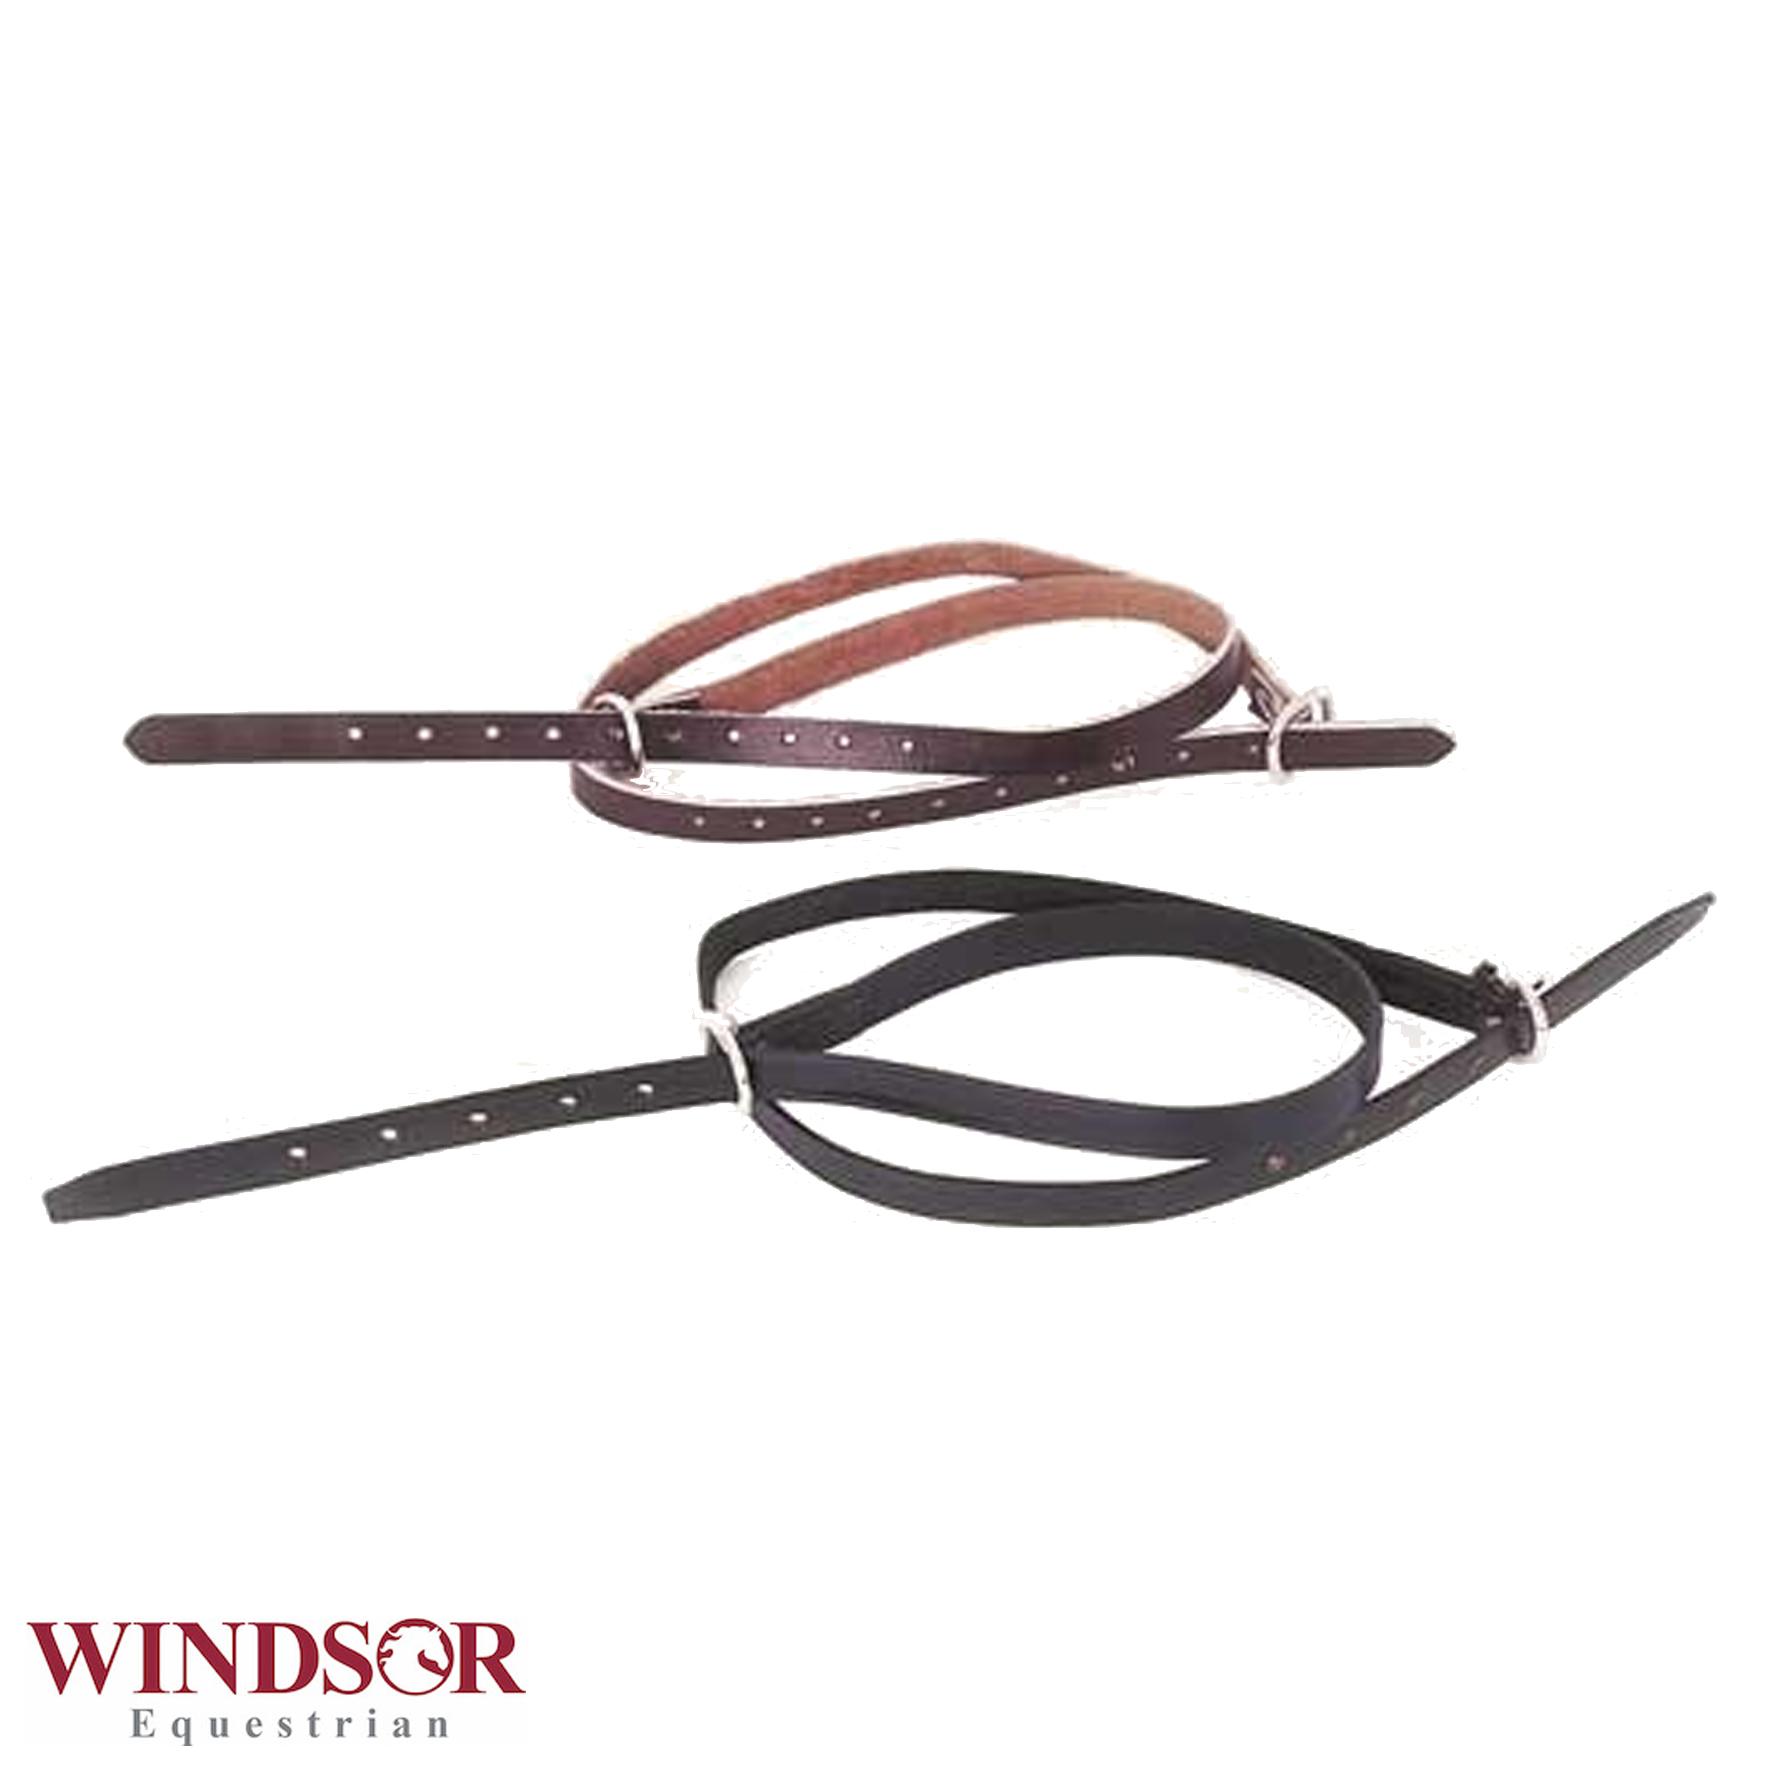 Windsor Equestrian Leather Spur Straps